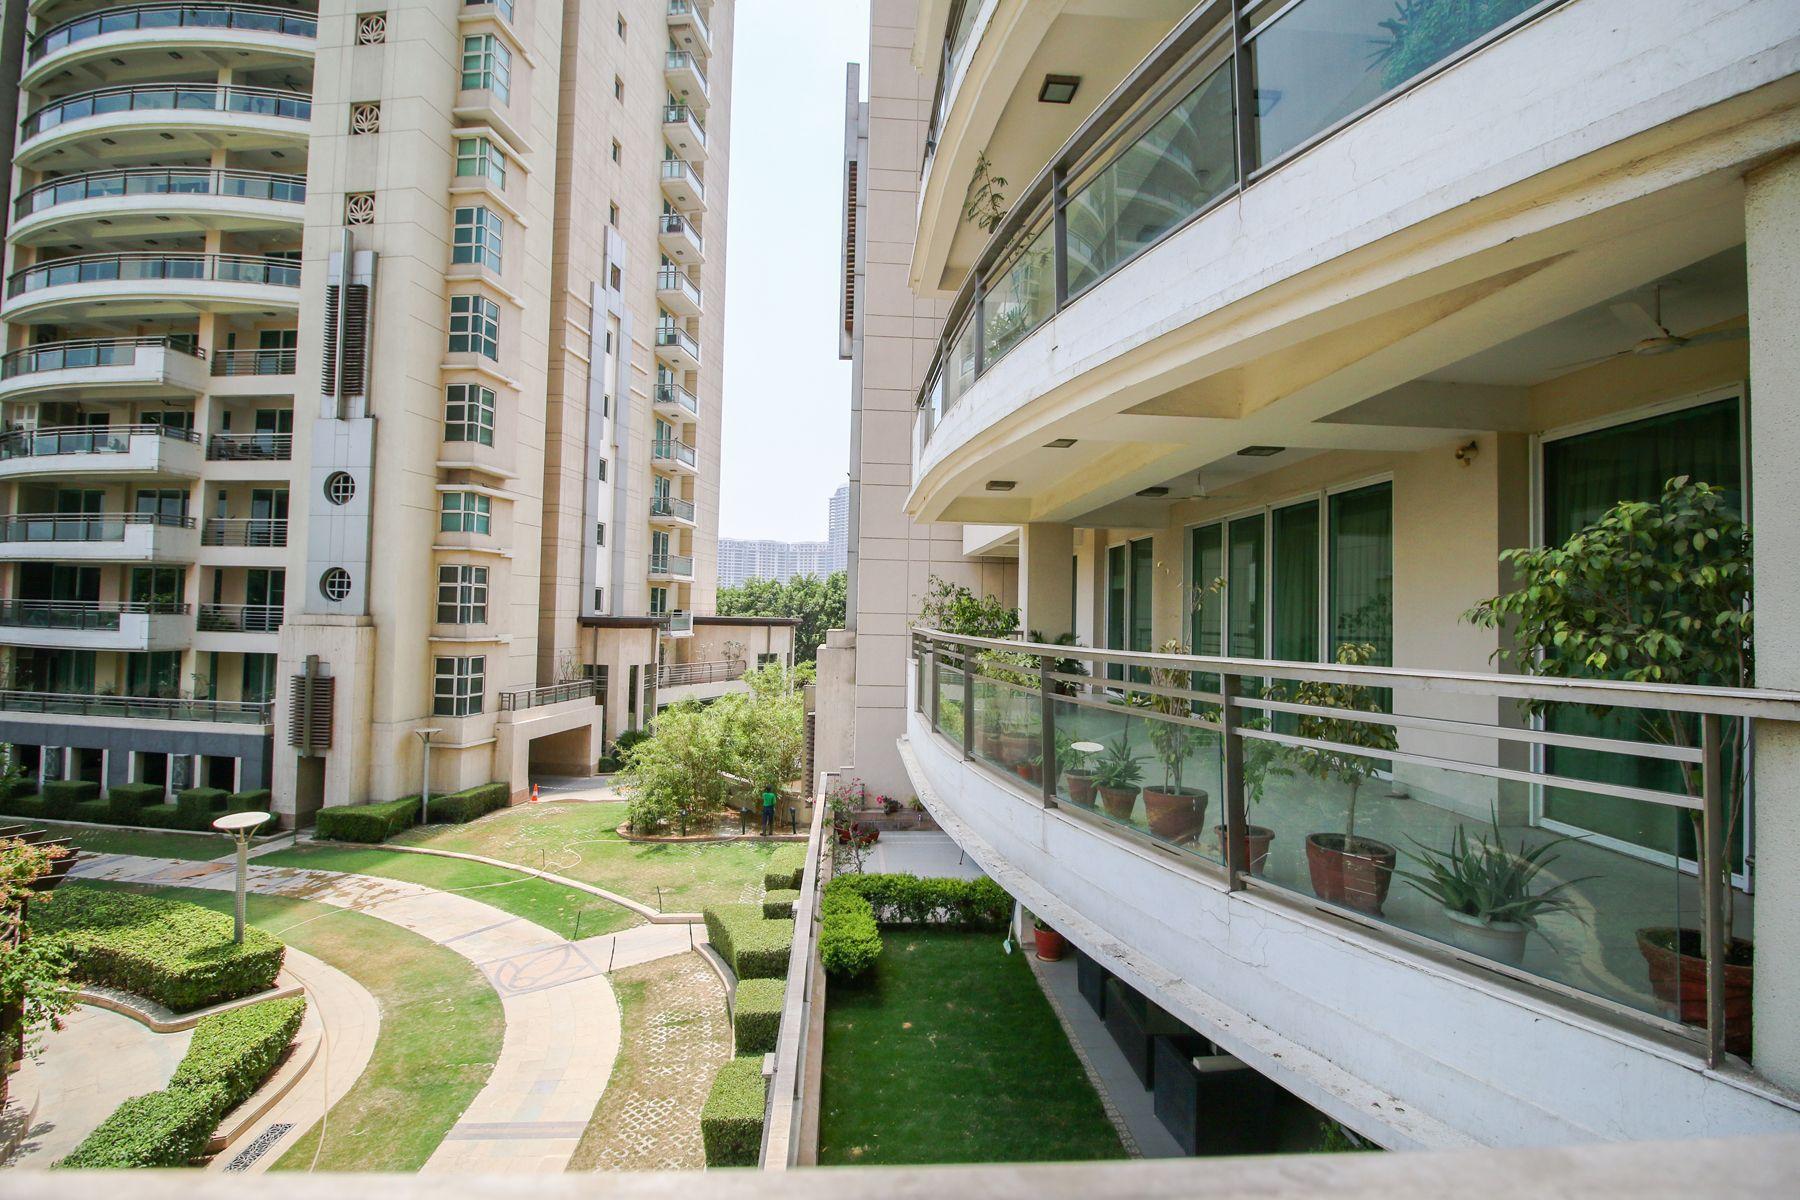 DLF Aralias 4 BHK Apartments in Gurgaon Apartments for